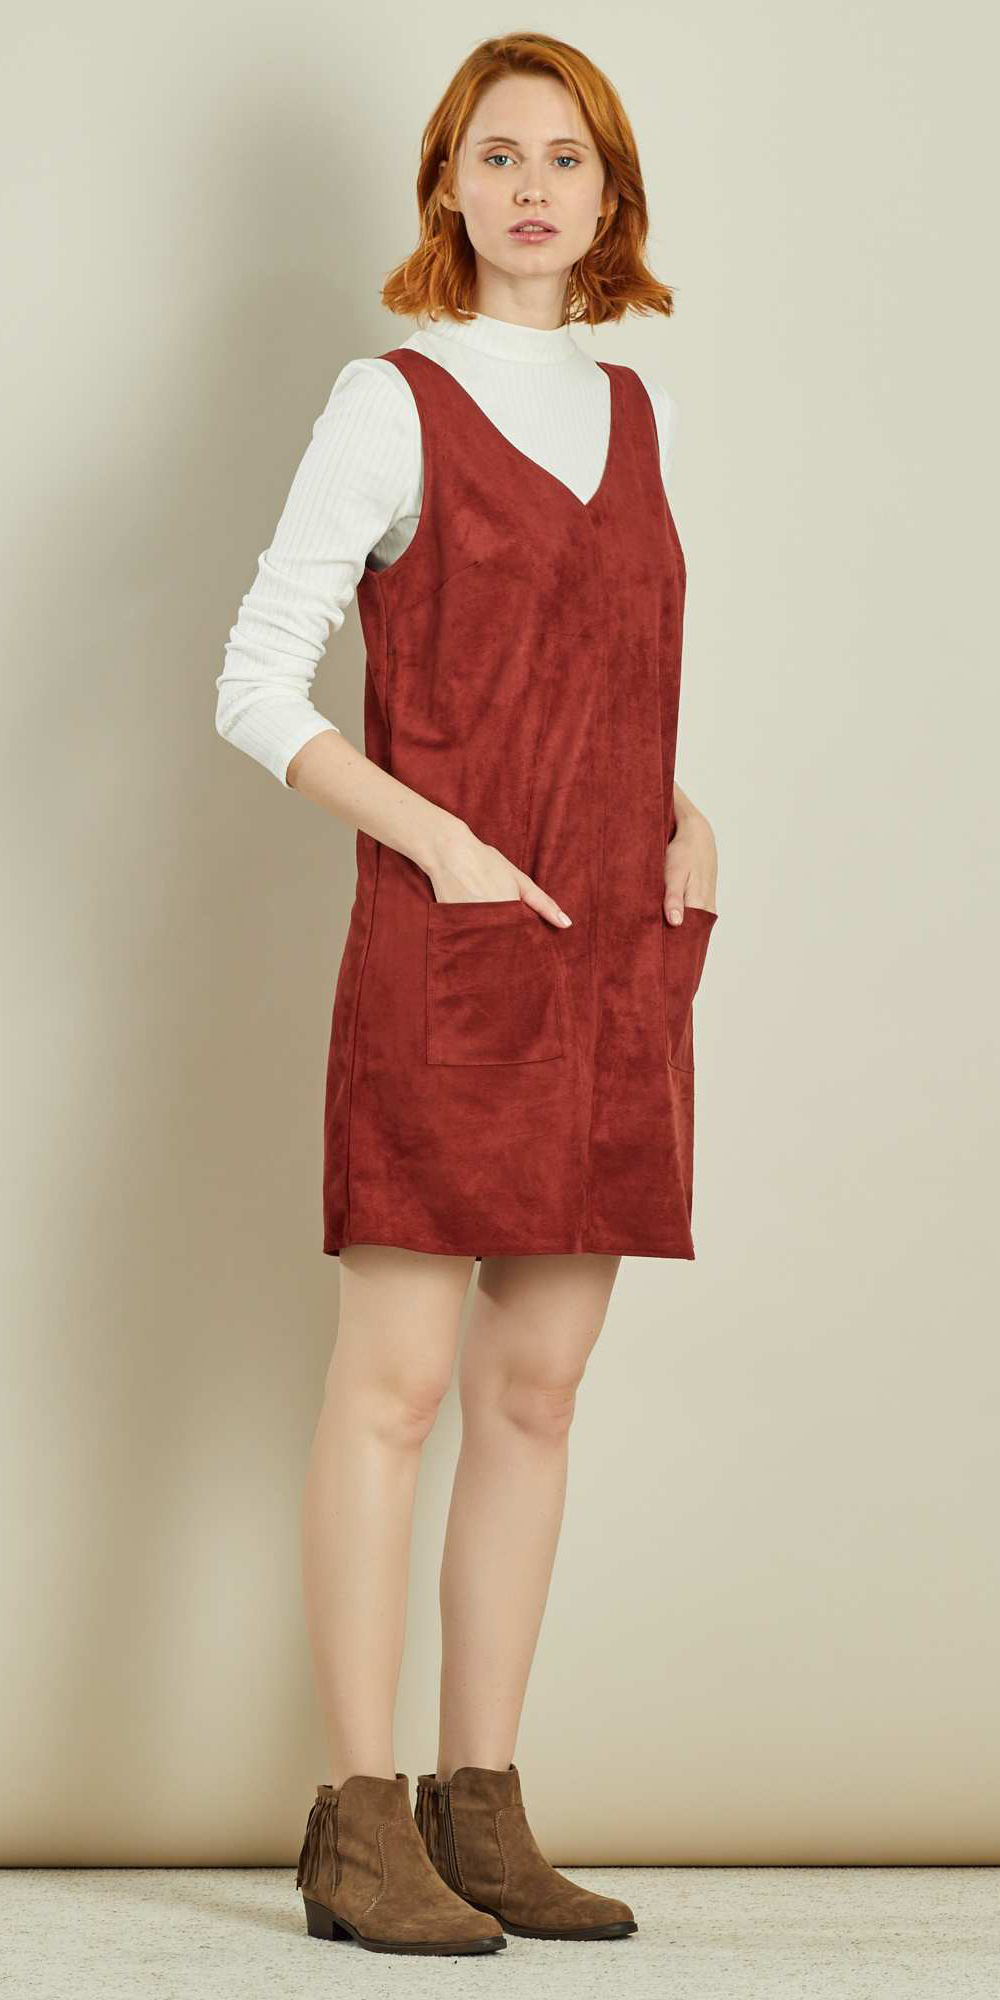 red-dress-jumper-white-tee-layer-hairr-bob-cognac-shoe-booties-fall-winter-weekend.jpg